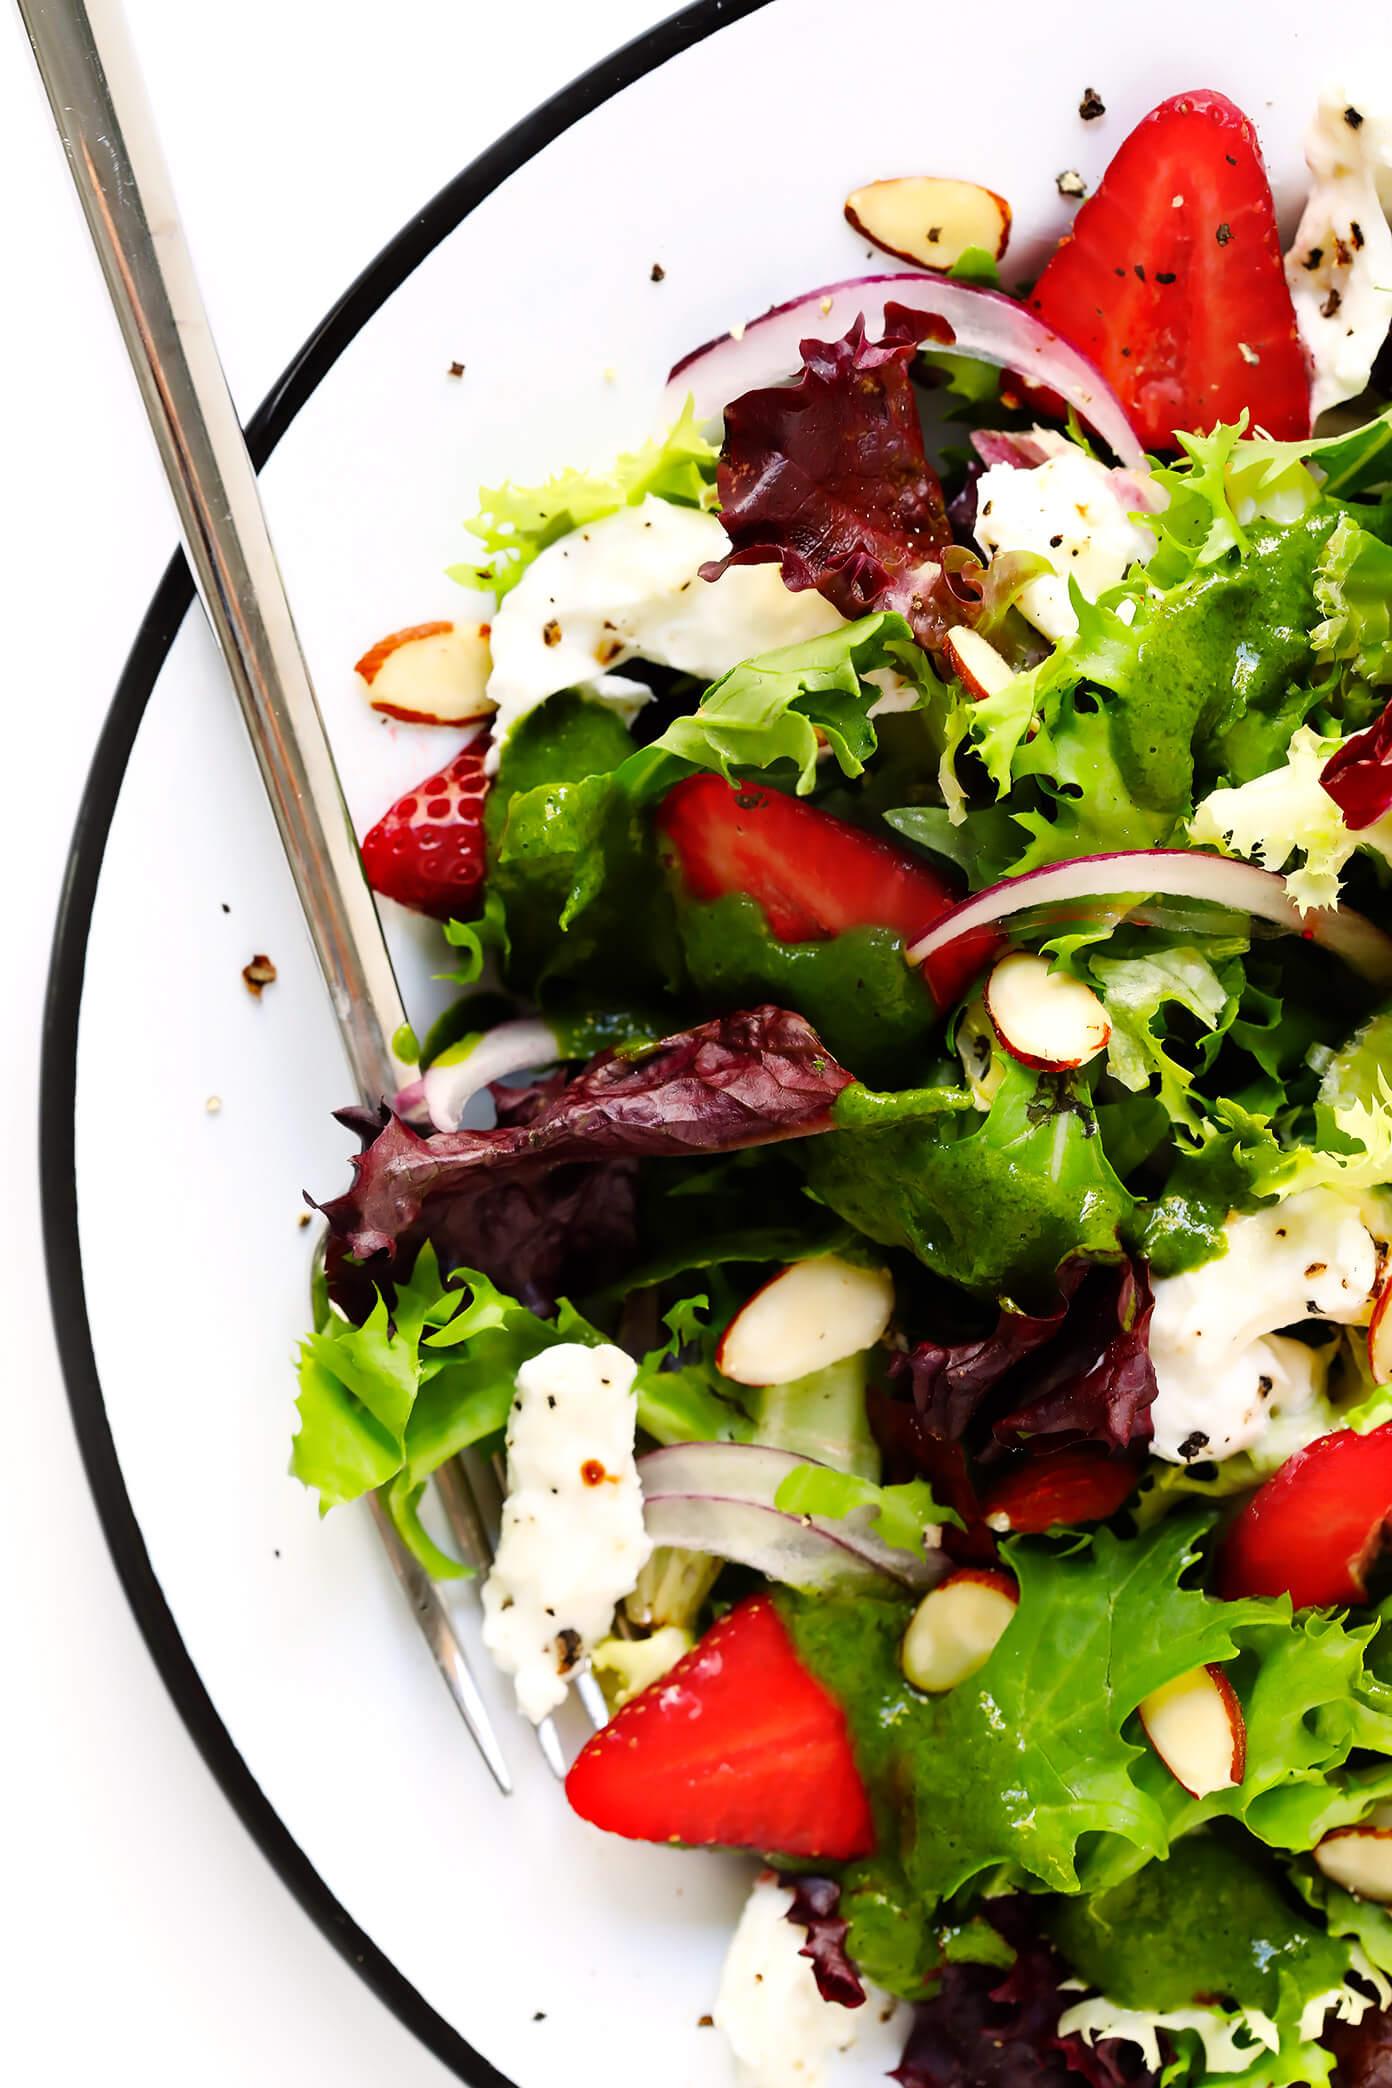 Strawberry Salad with Burrata and Basil Vinaigrette